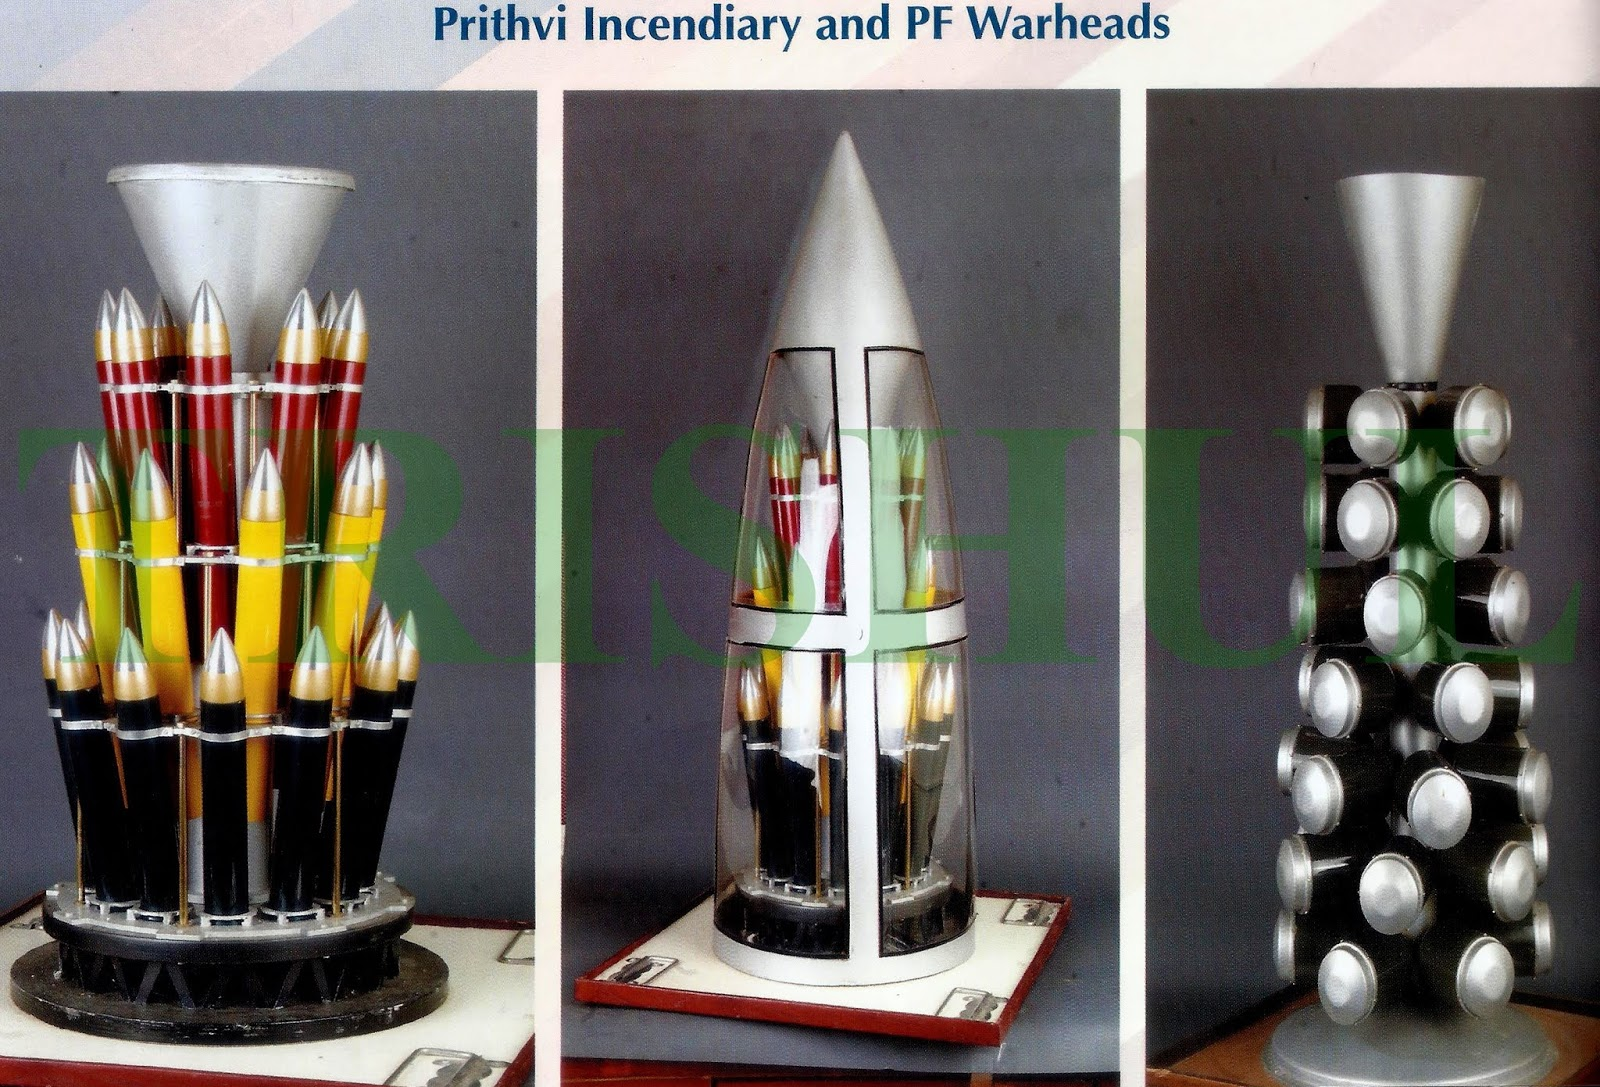 Prithvi-1 Warheads-1.jpg